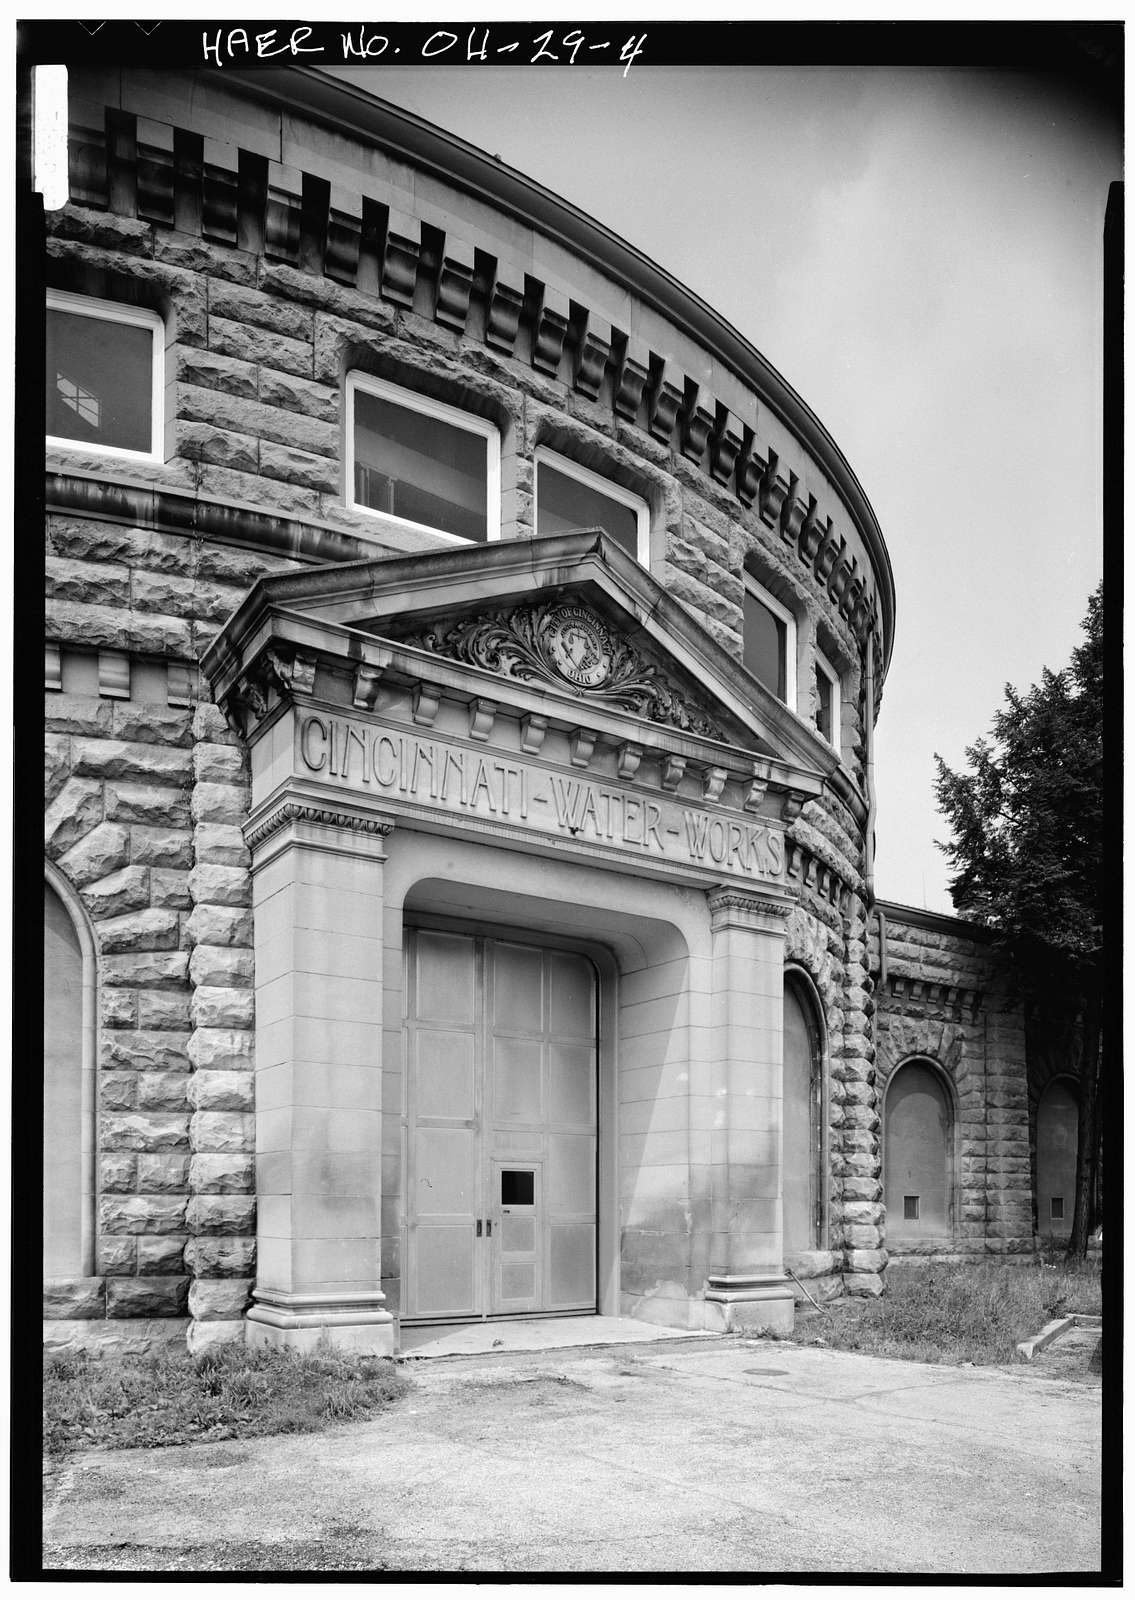 River Pumping Station, Cincinnati Water Works, 5800 Kellogg Avenue, California District, Cincinnati, Hamilton County, OH